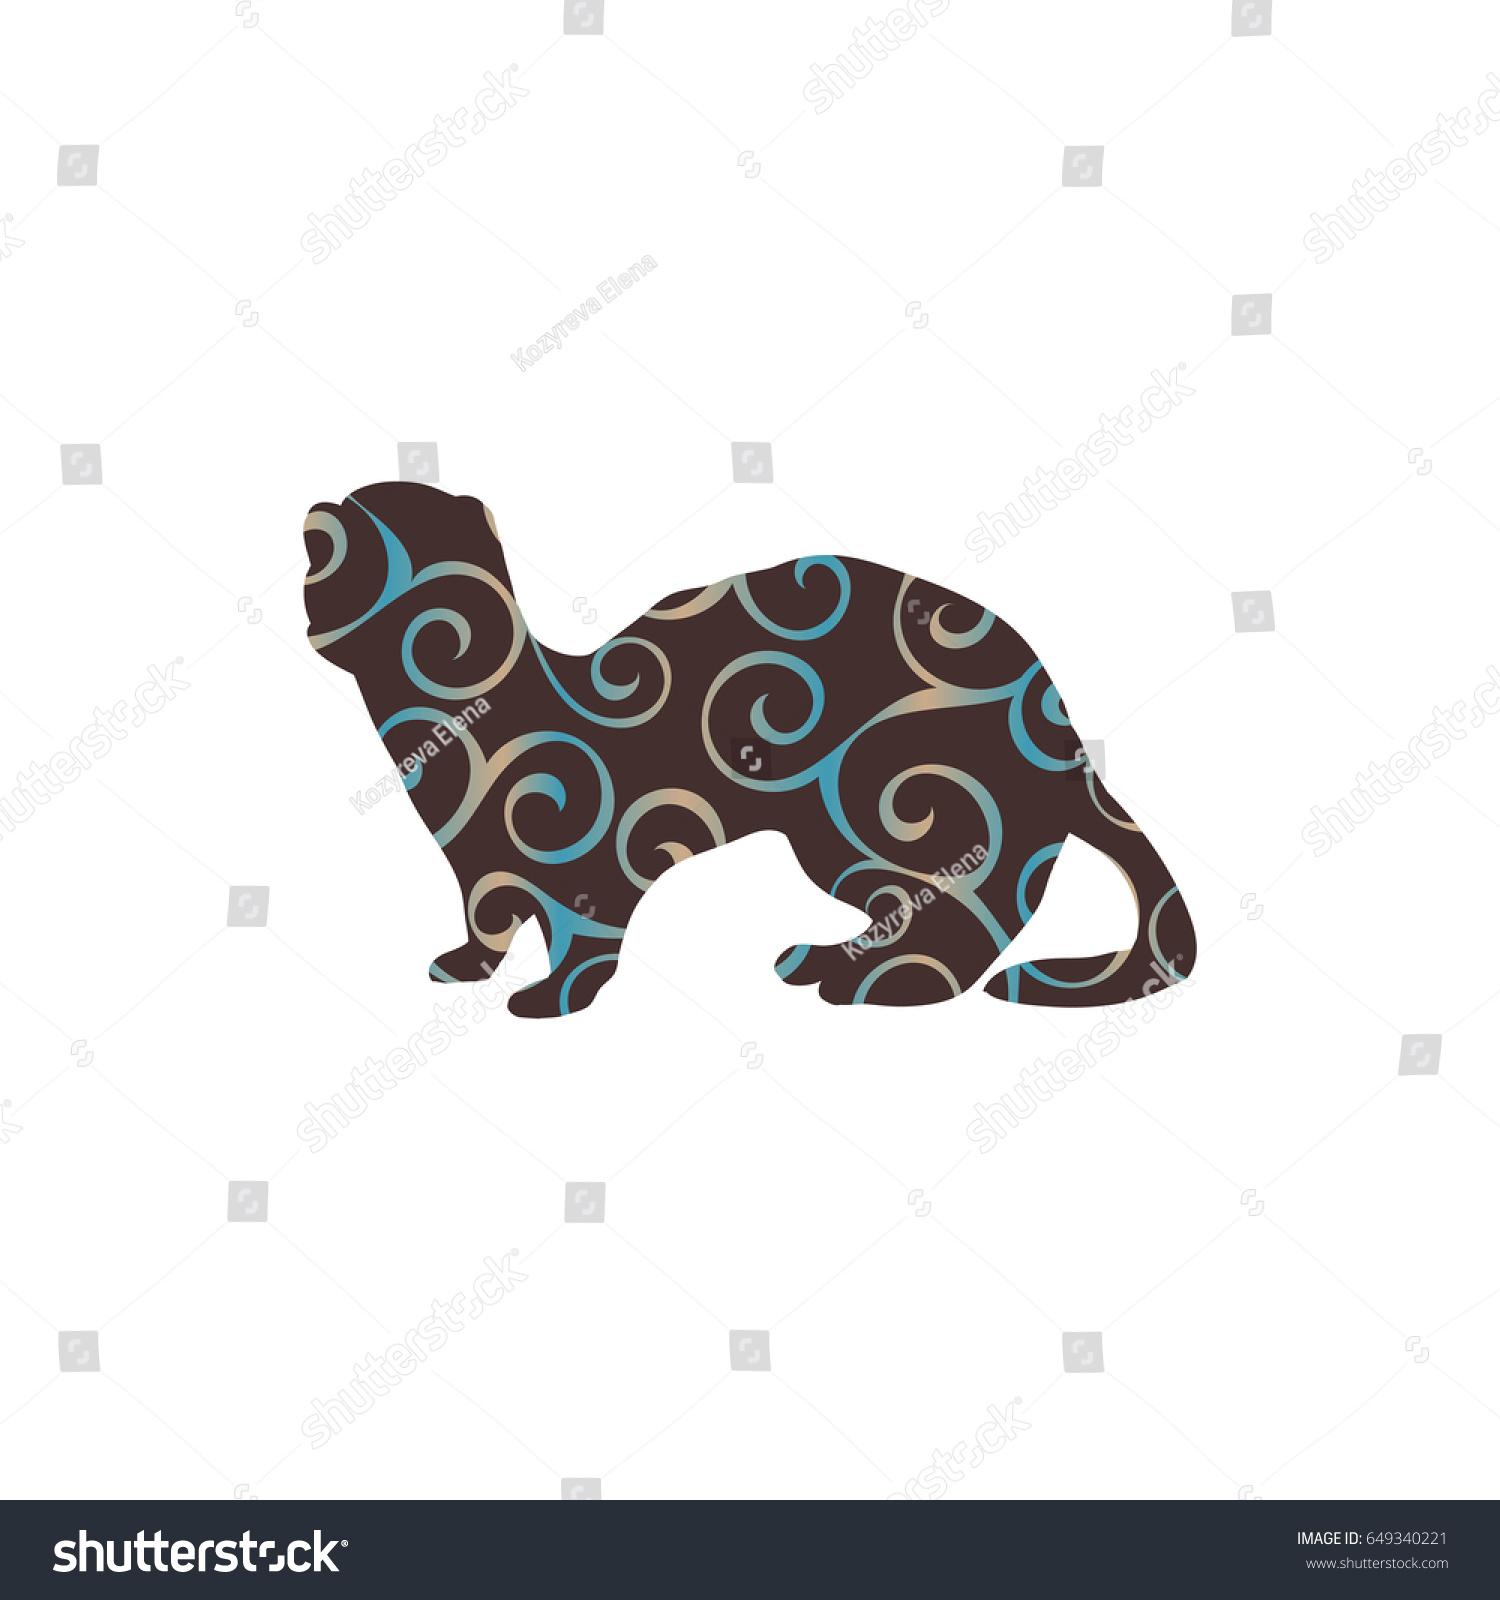 Ferret Weasel Ermine Mammal Color